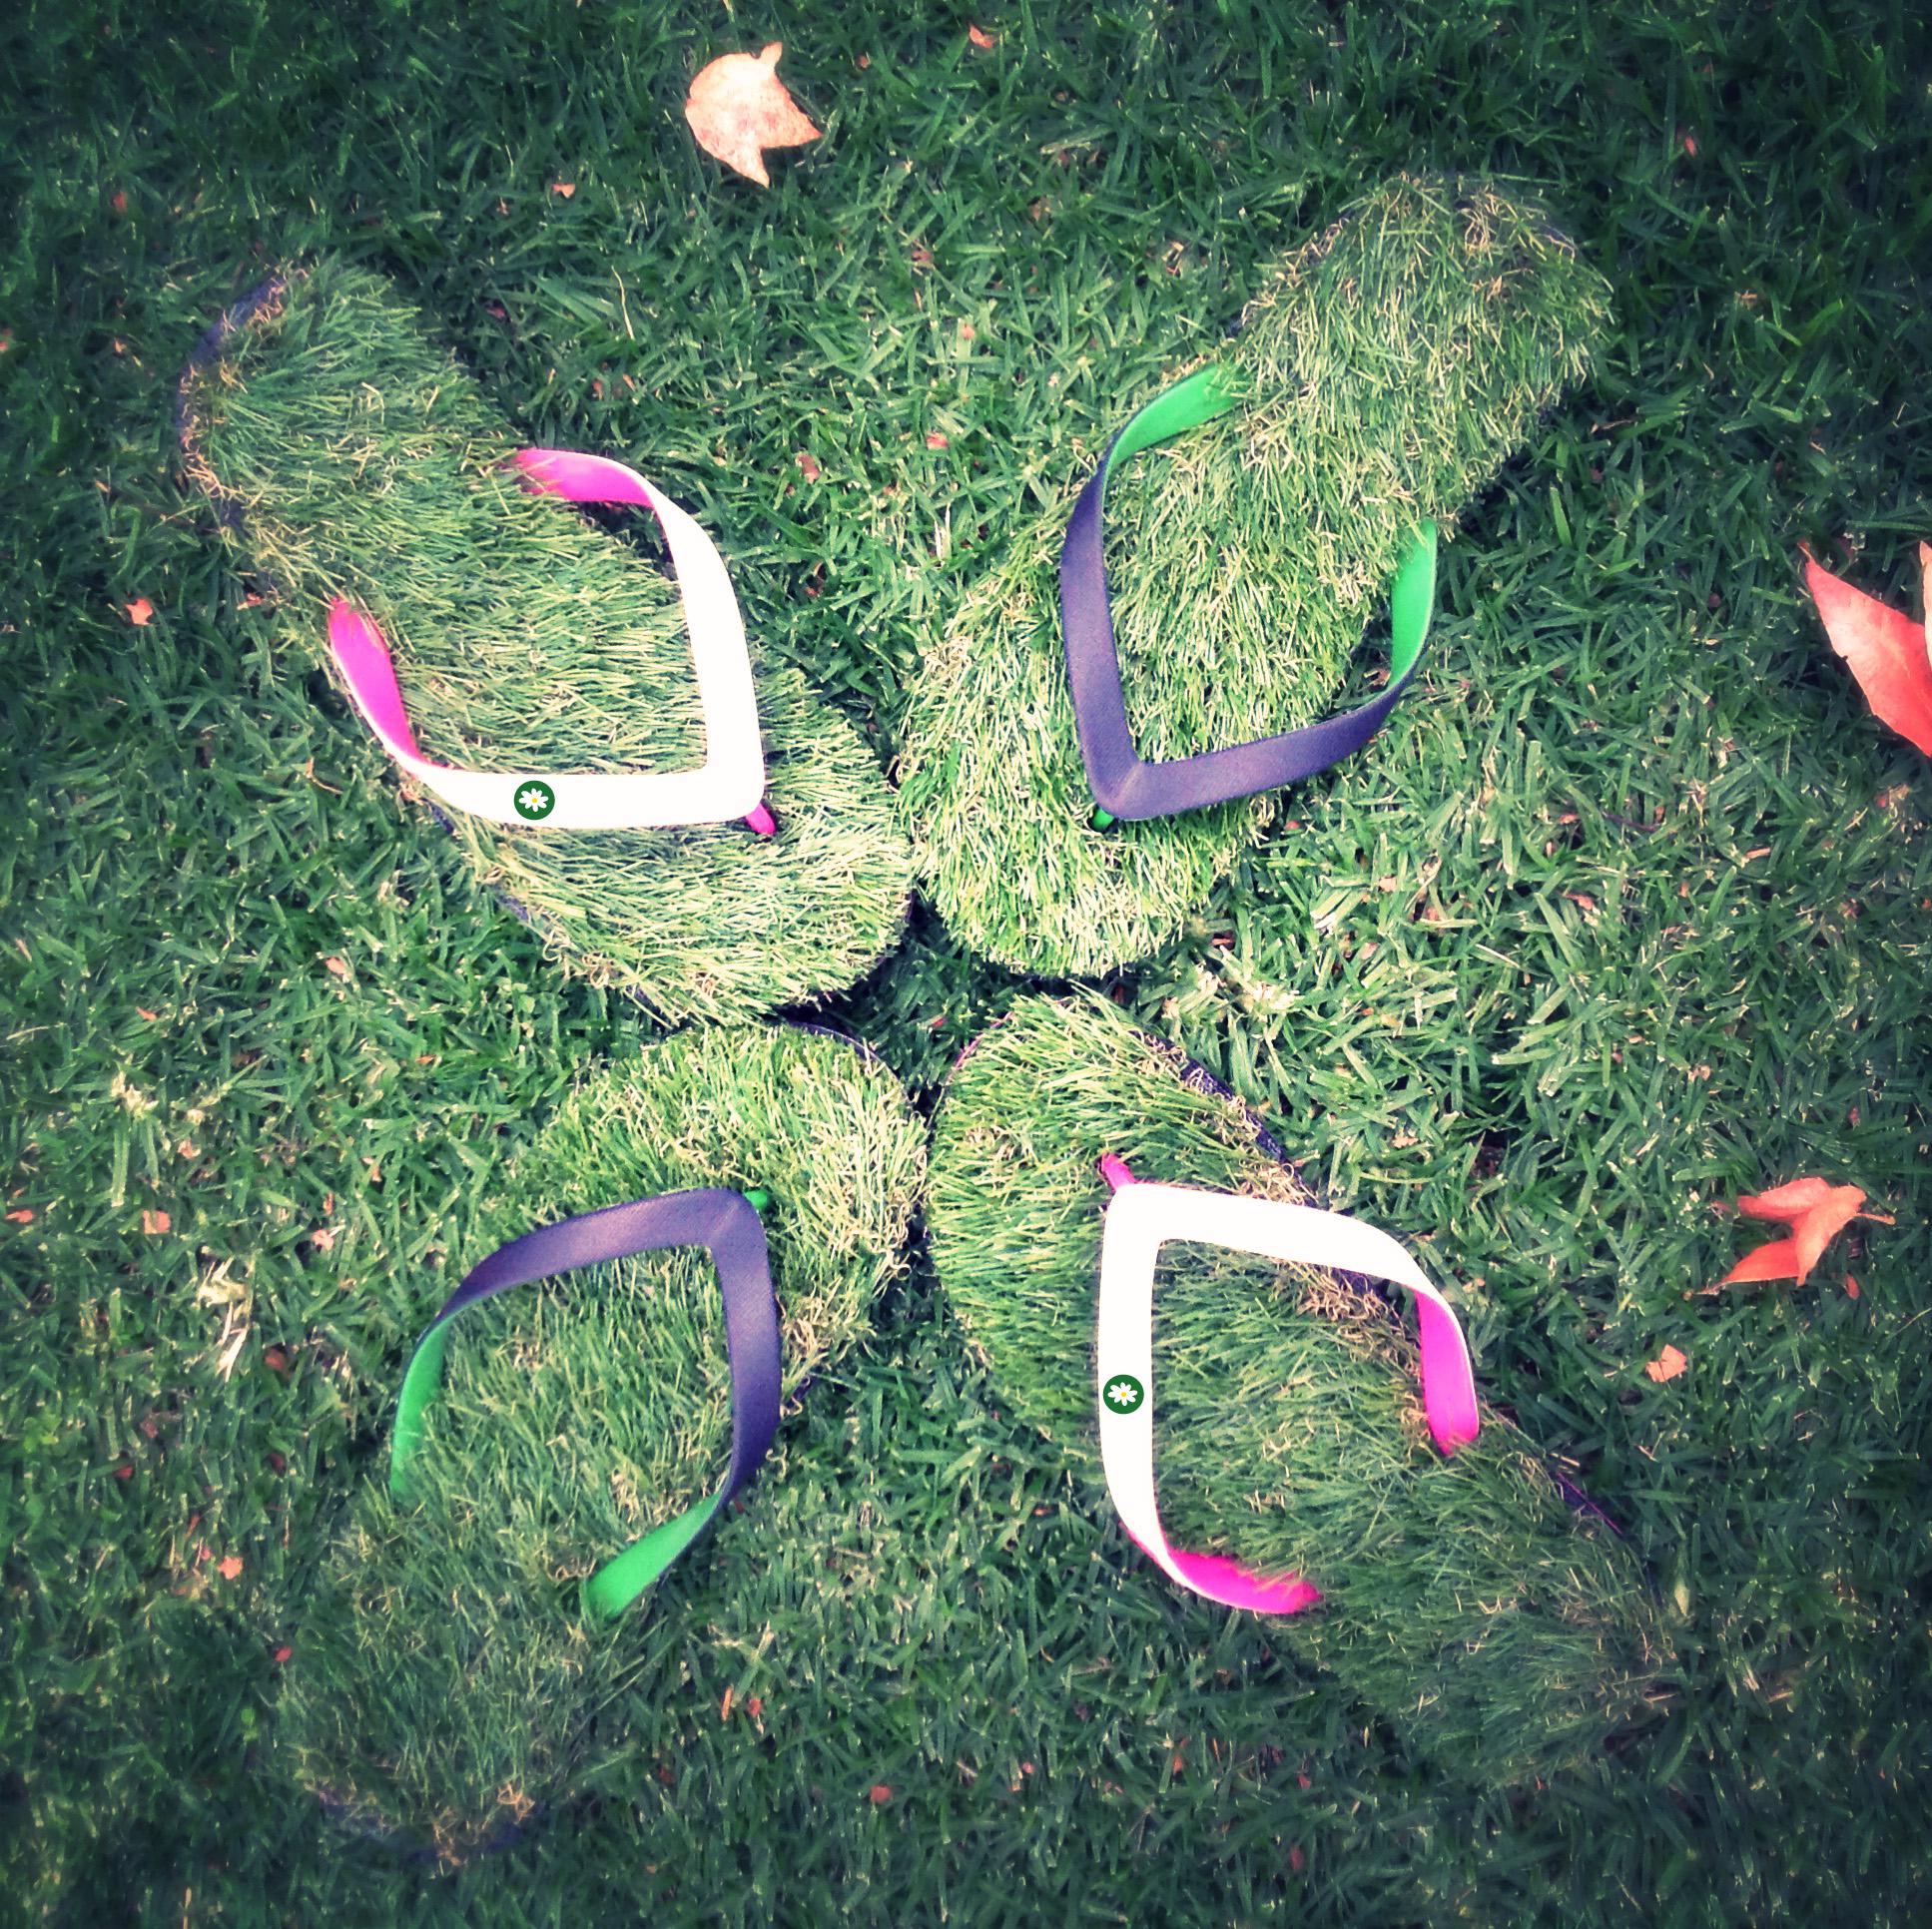 aa7efc36e8dc1c Grass Flip Flops are High Quality Durable Sandals